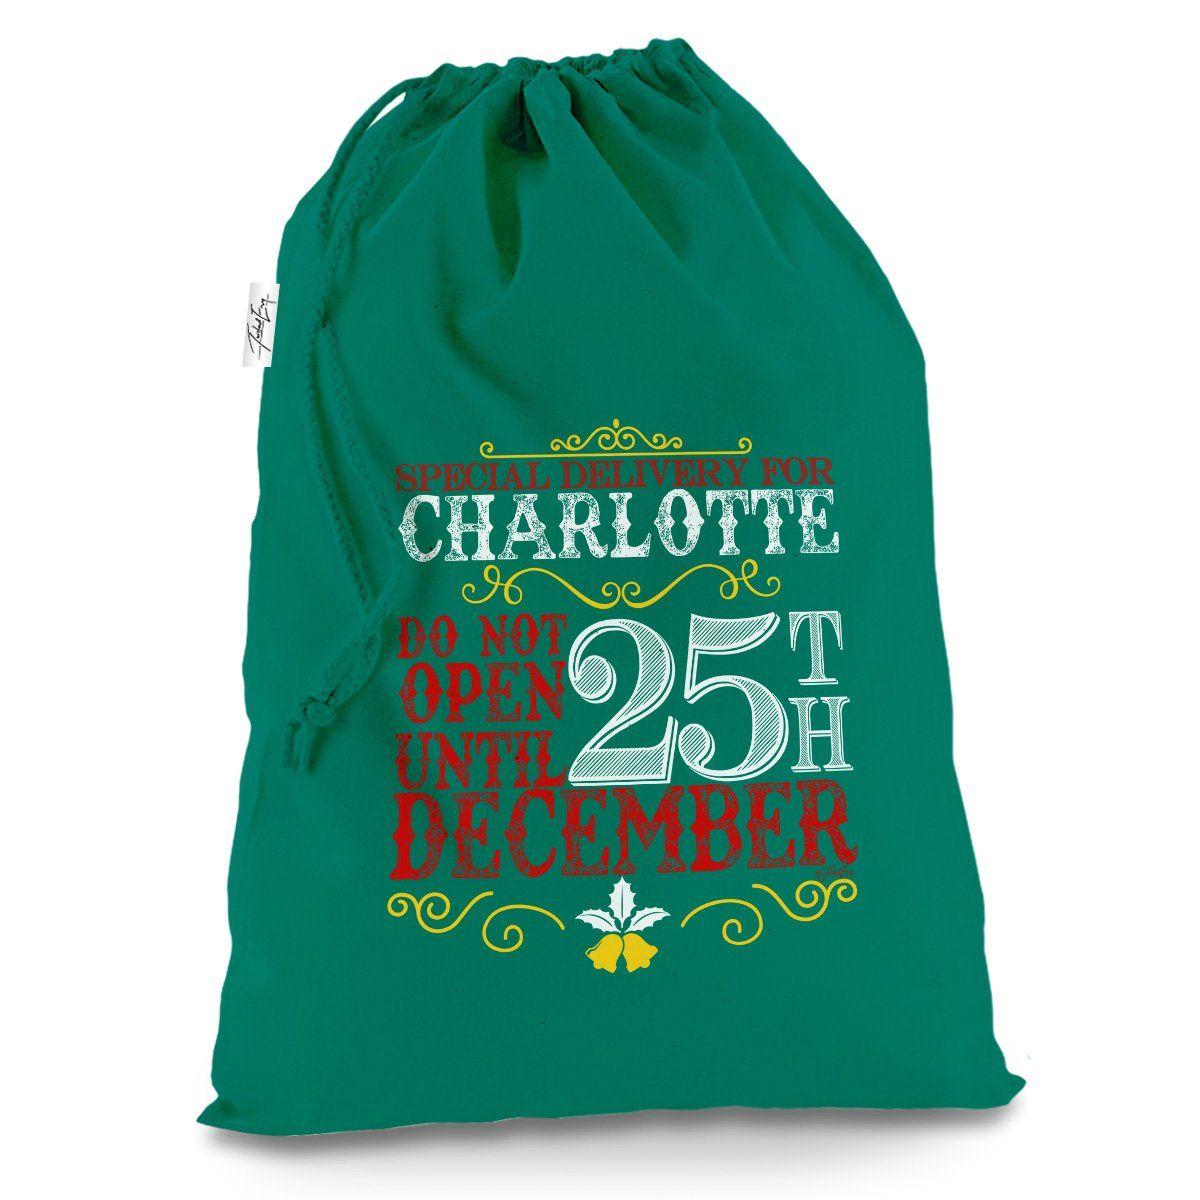 Do not open till christmas gift bags